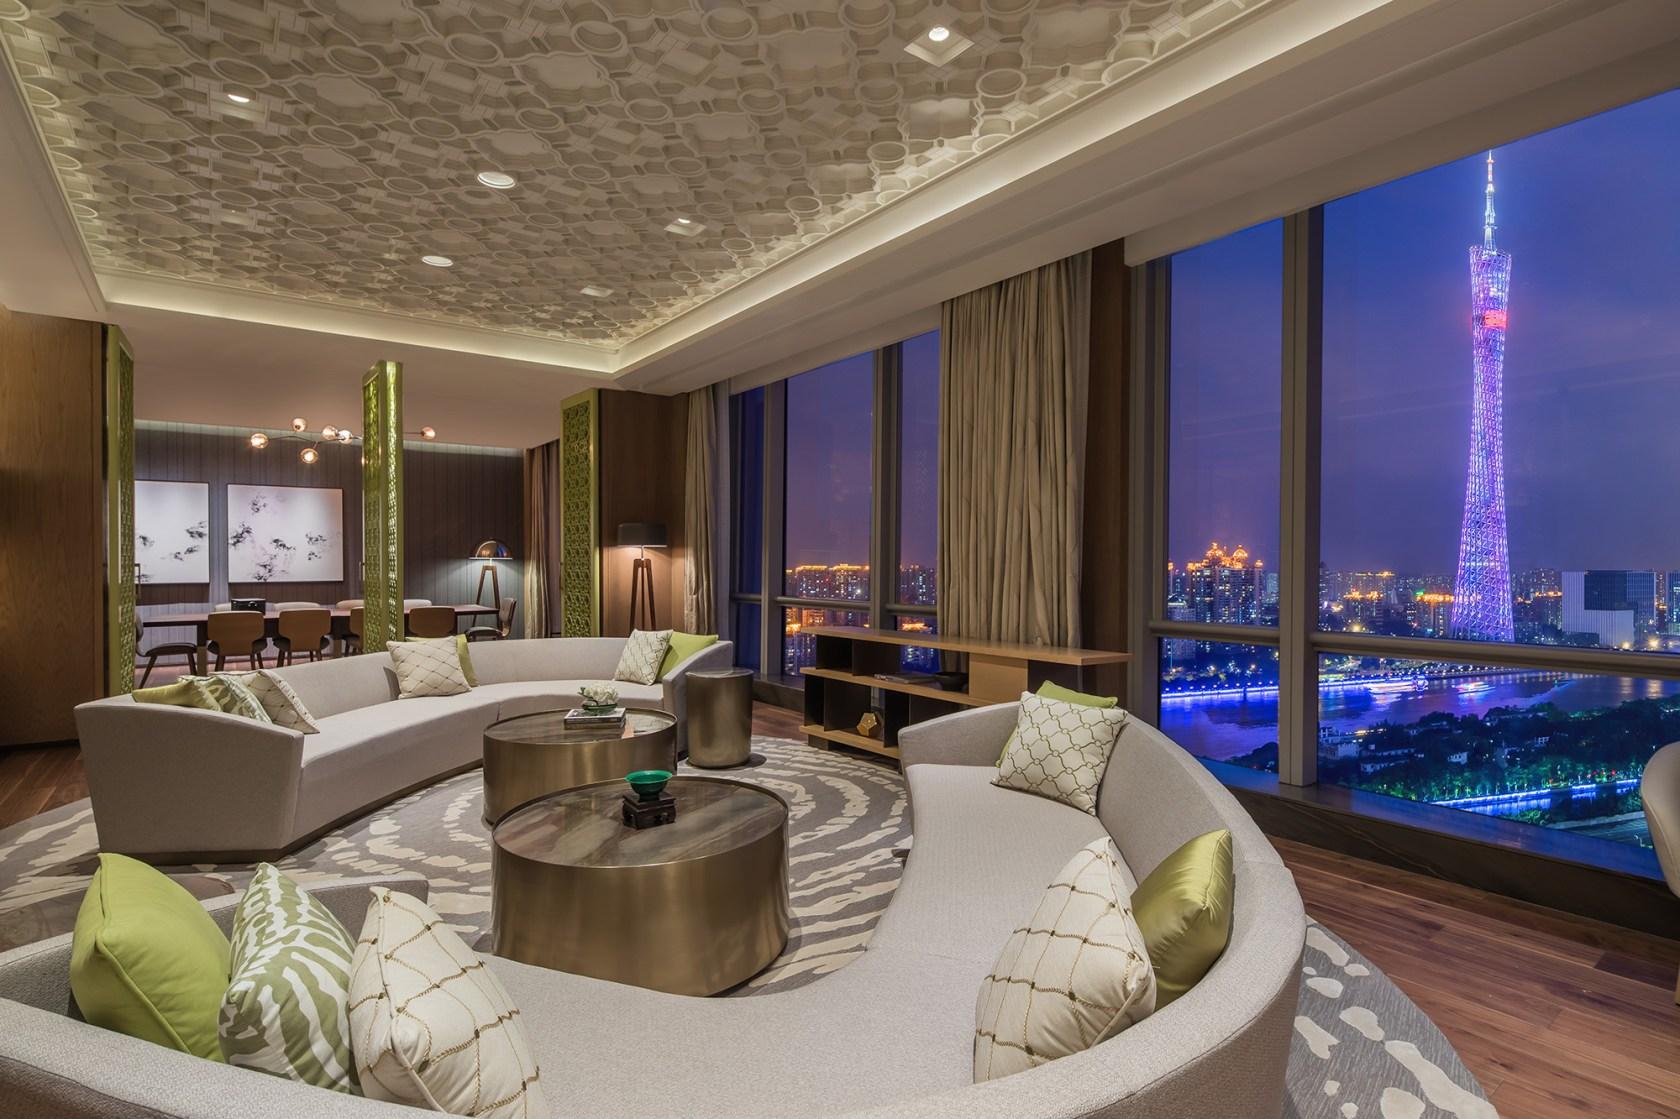 Ccd Cheng Chung Design Hk - Architizer